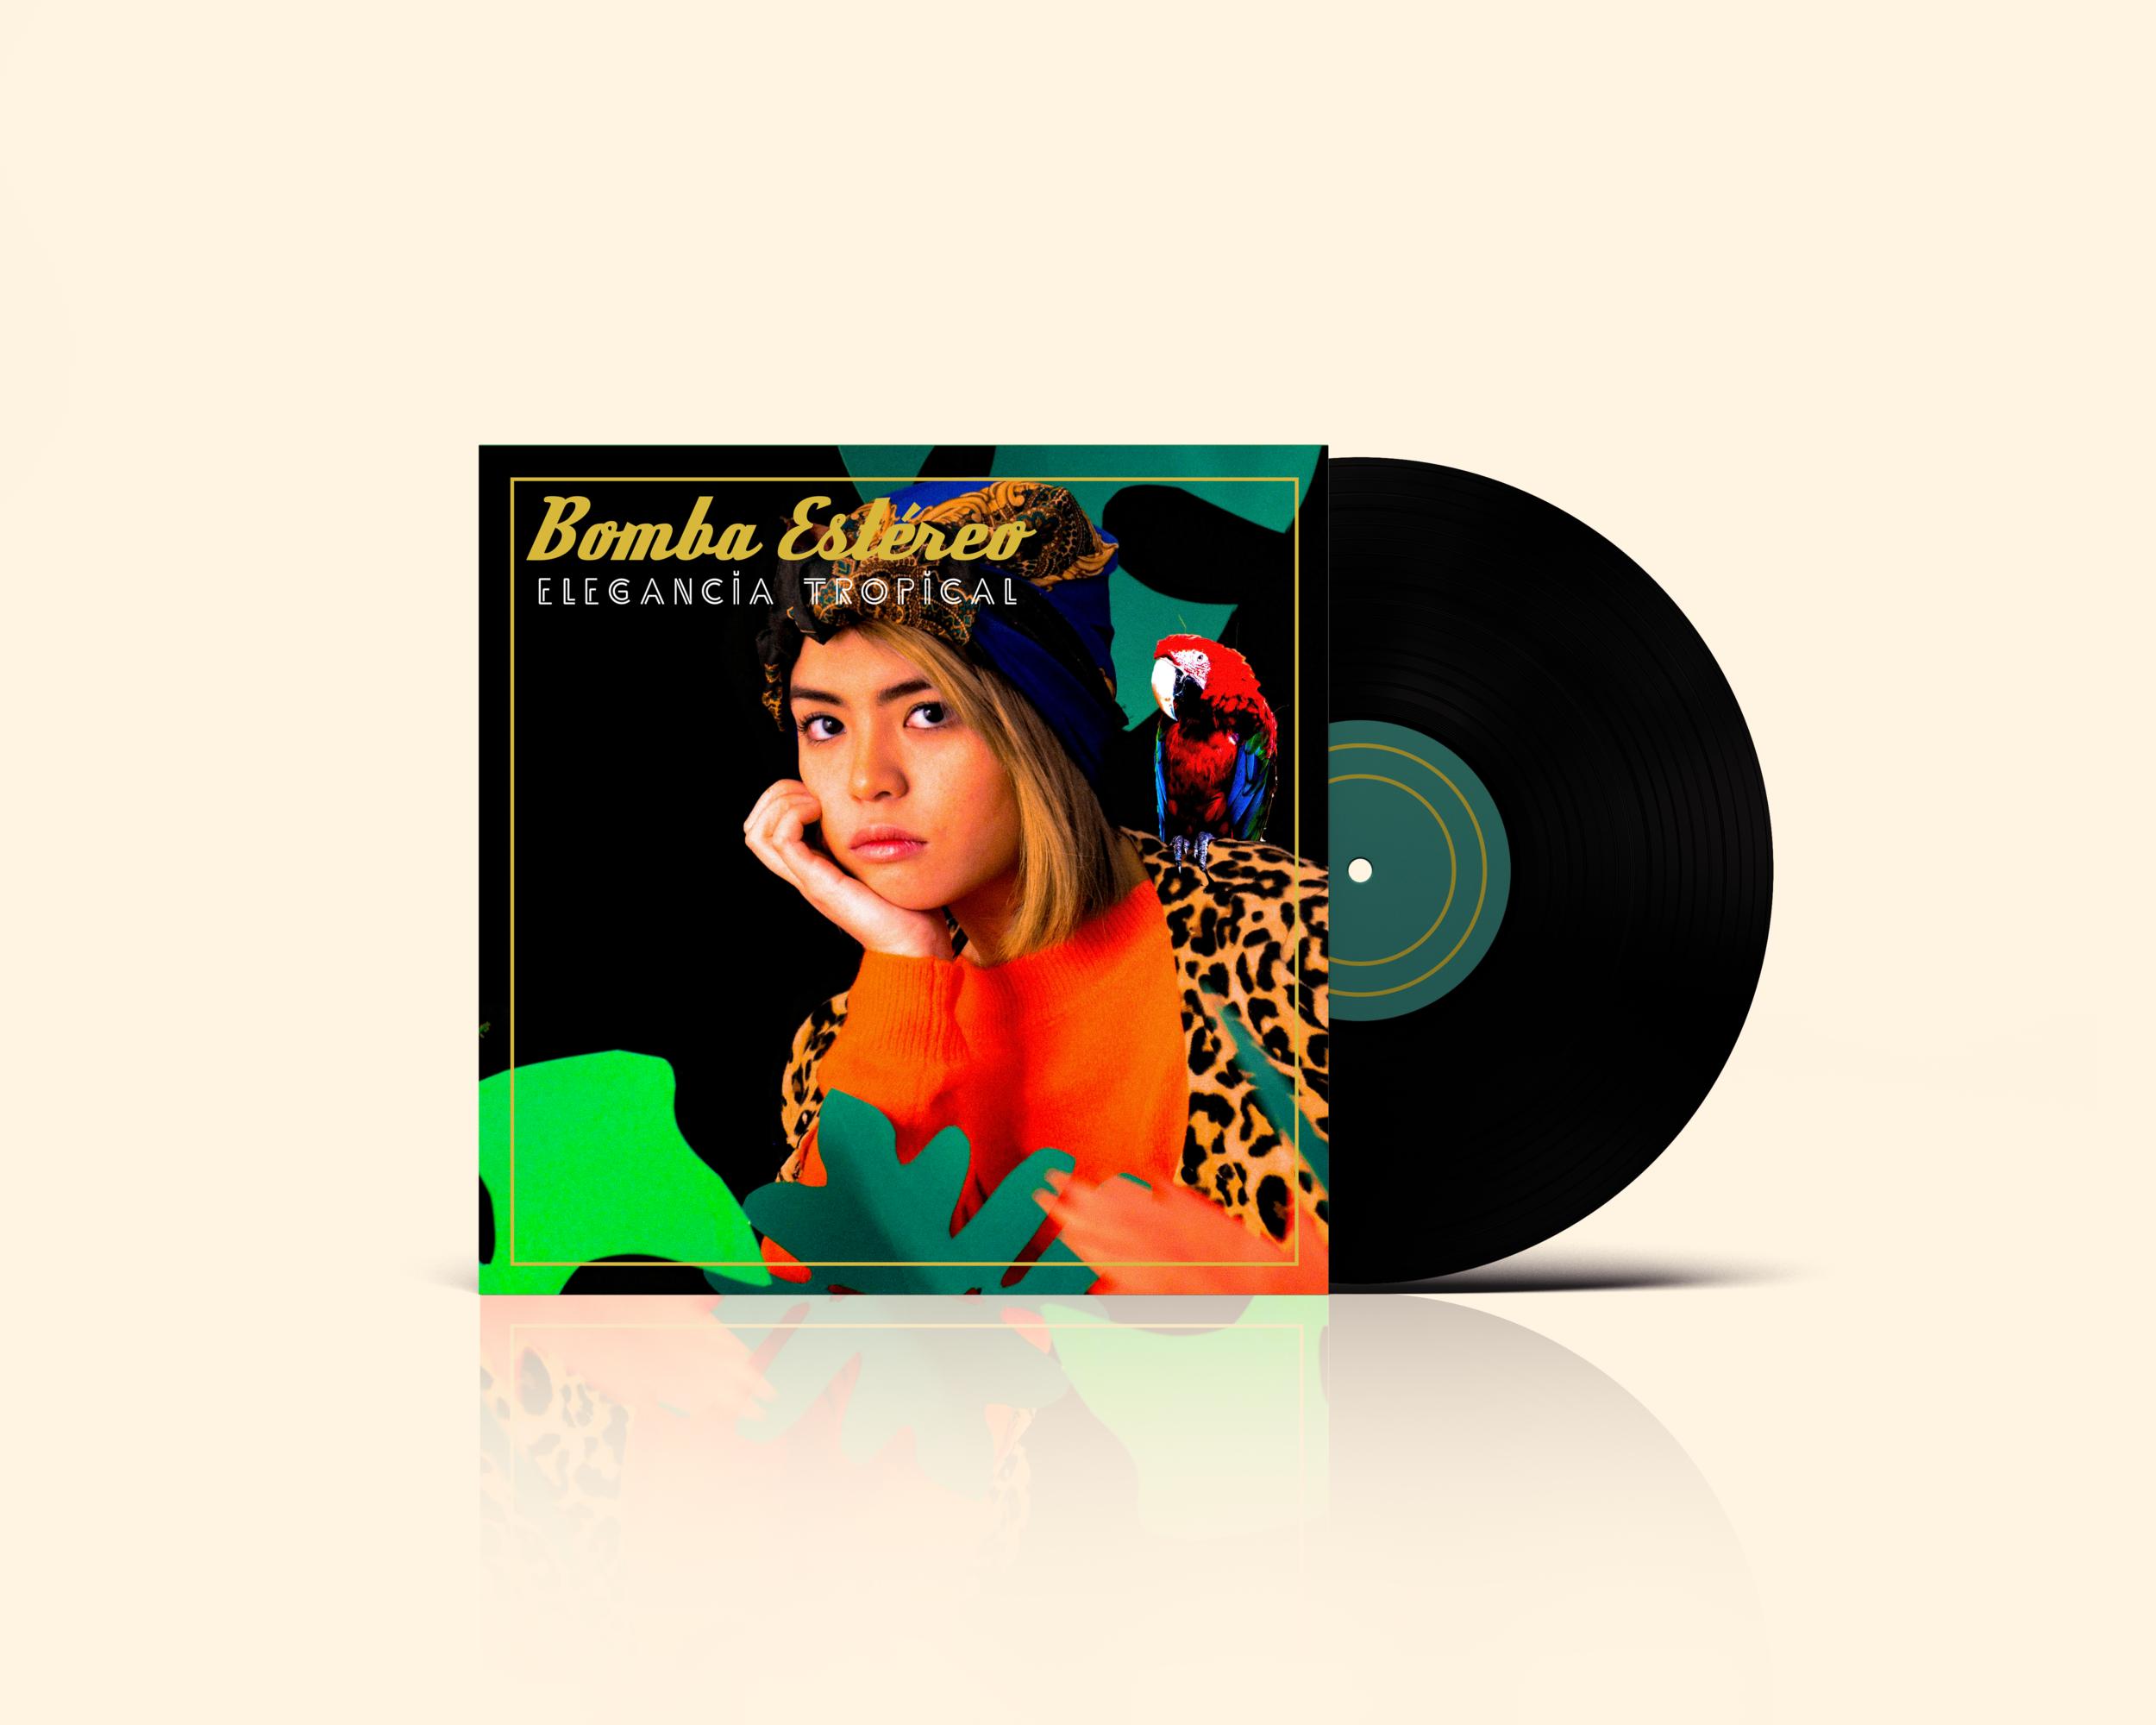 Album Cover Design Project